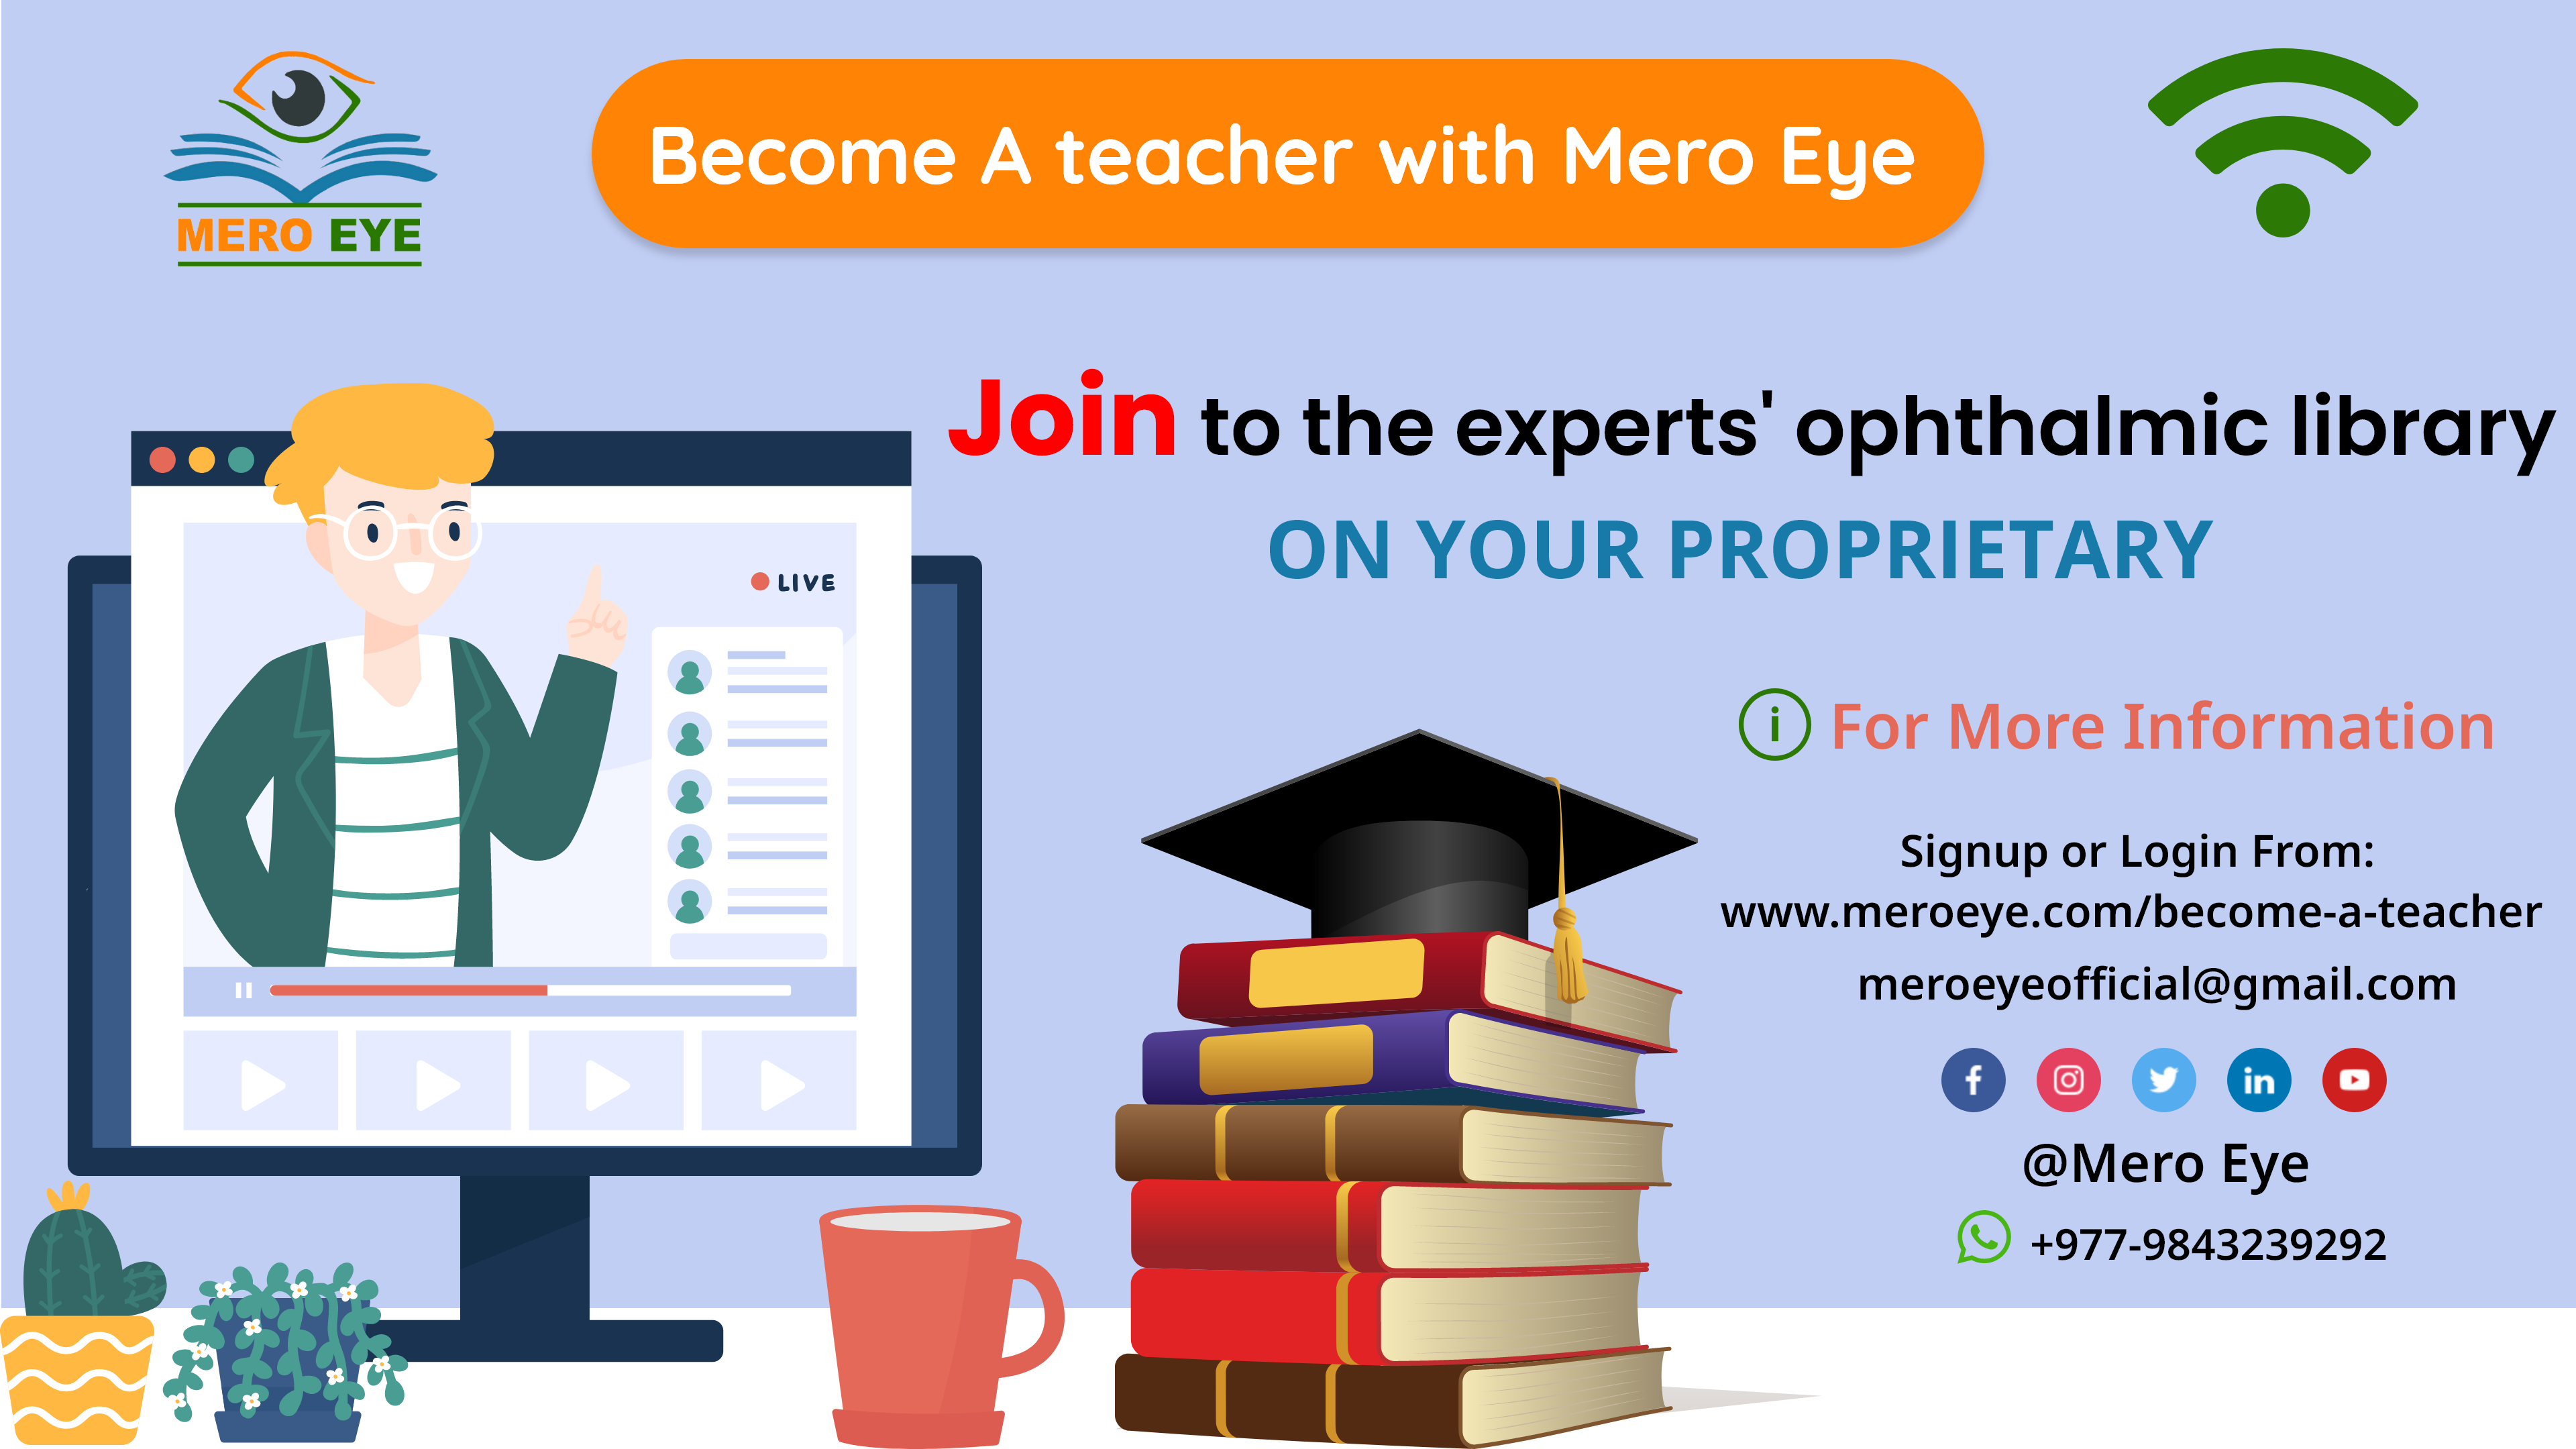 Became a teacher mero eye